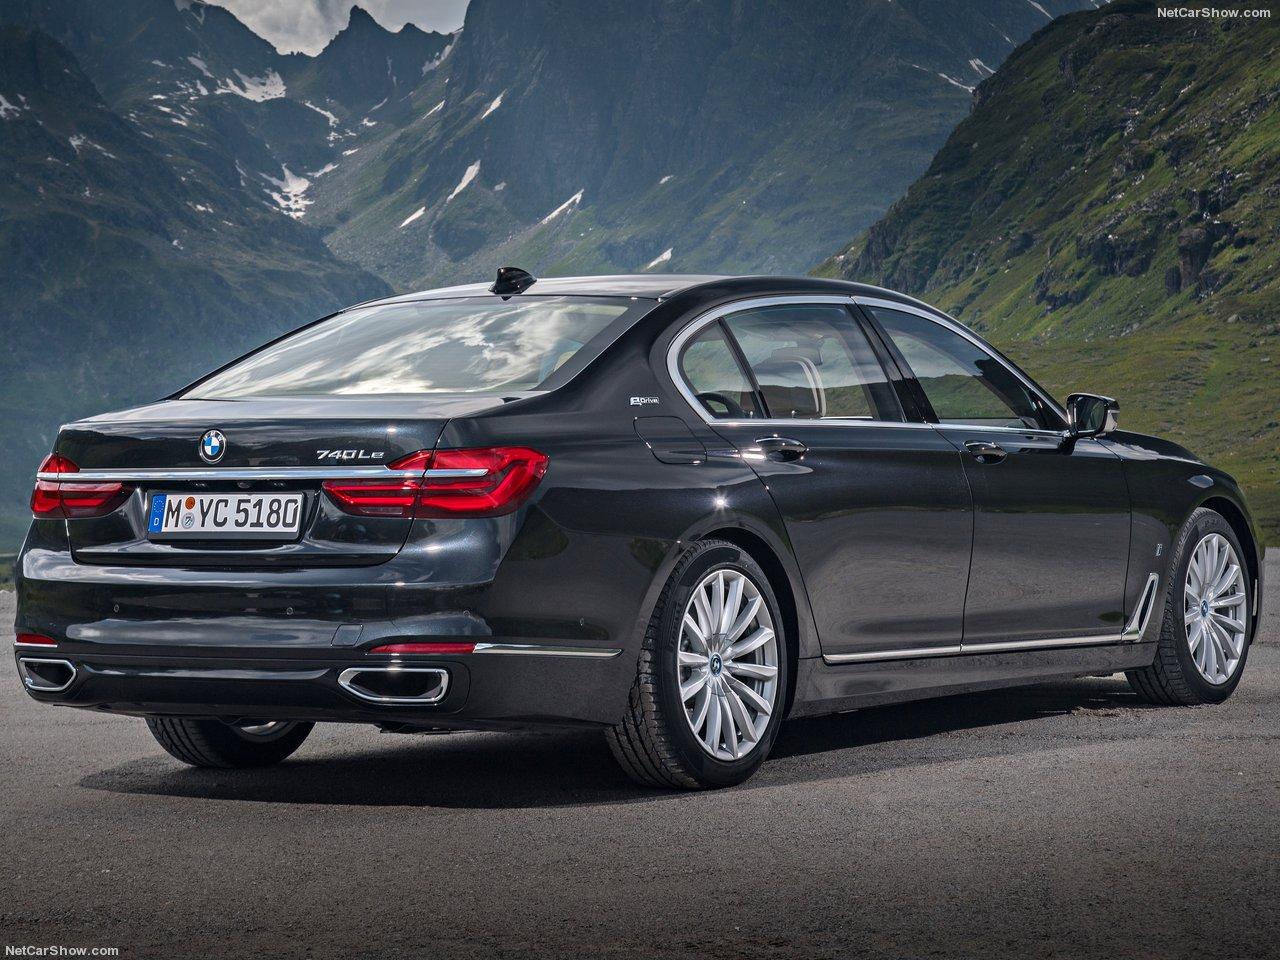 BMW-740Le_xDrive_iPerformance-2017-1280-12